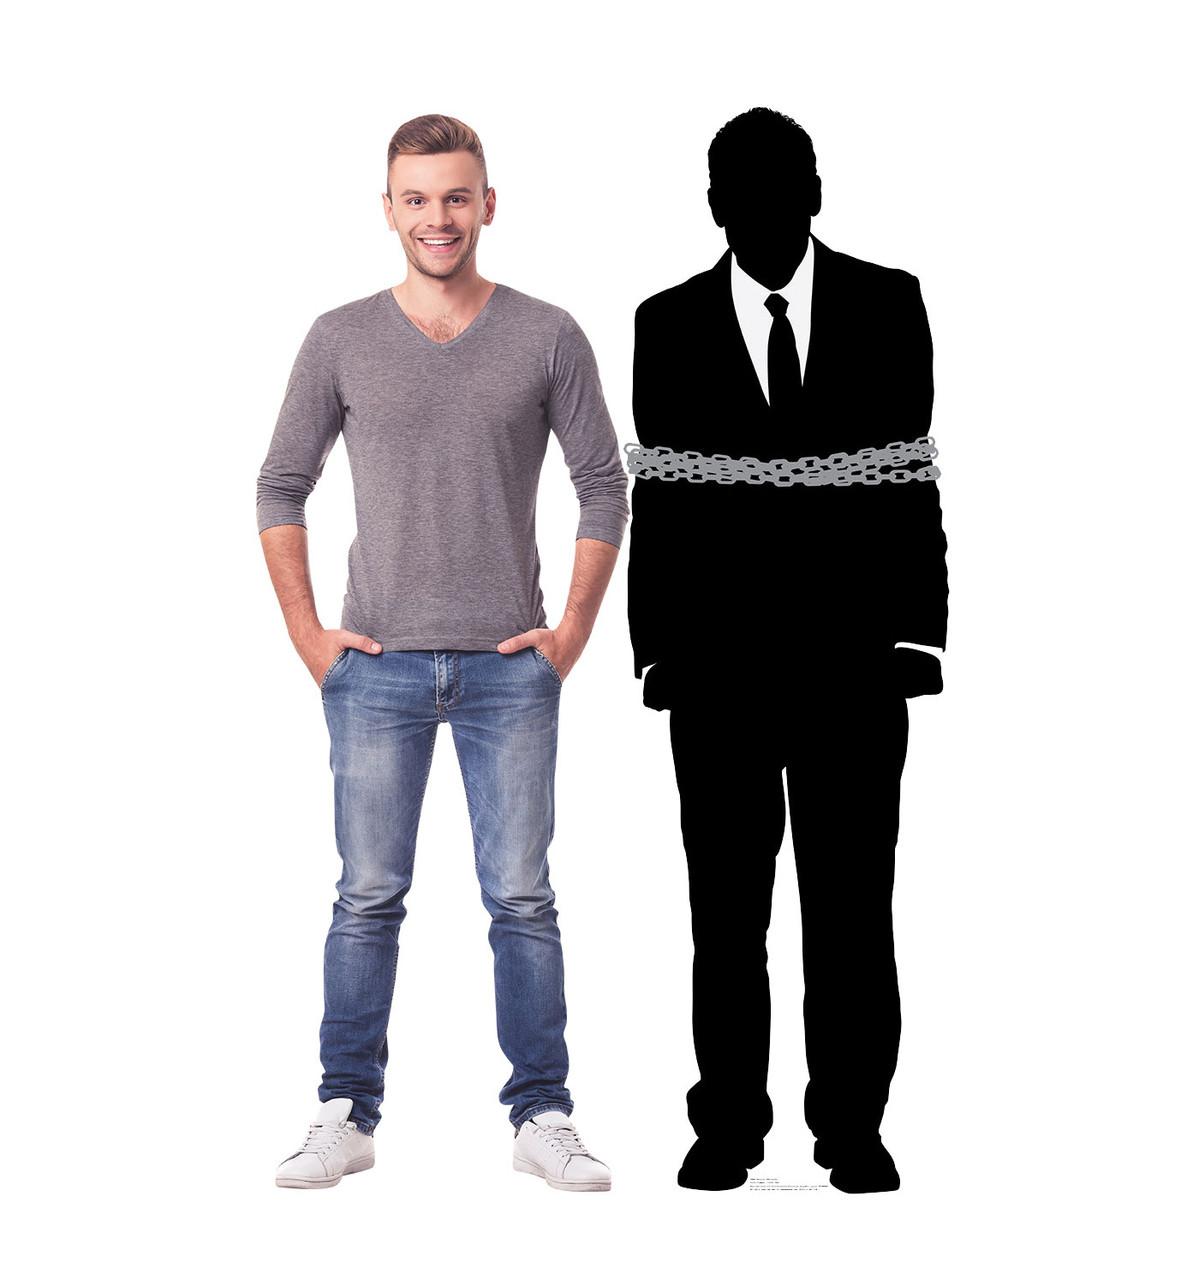 Prisoner Silhouette - Cardboard Cutout